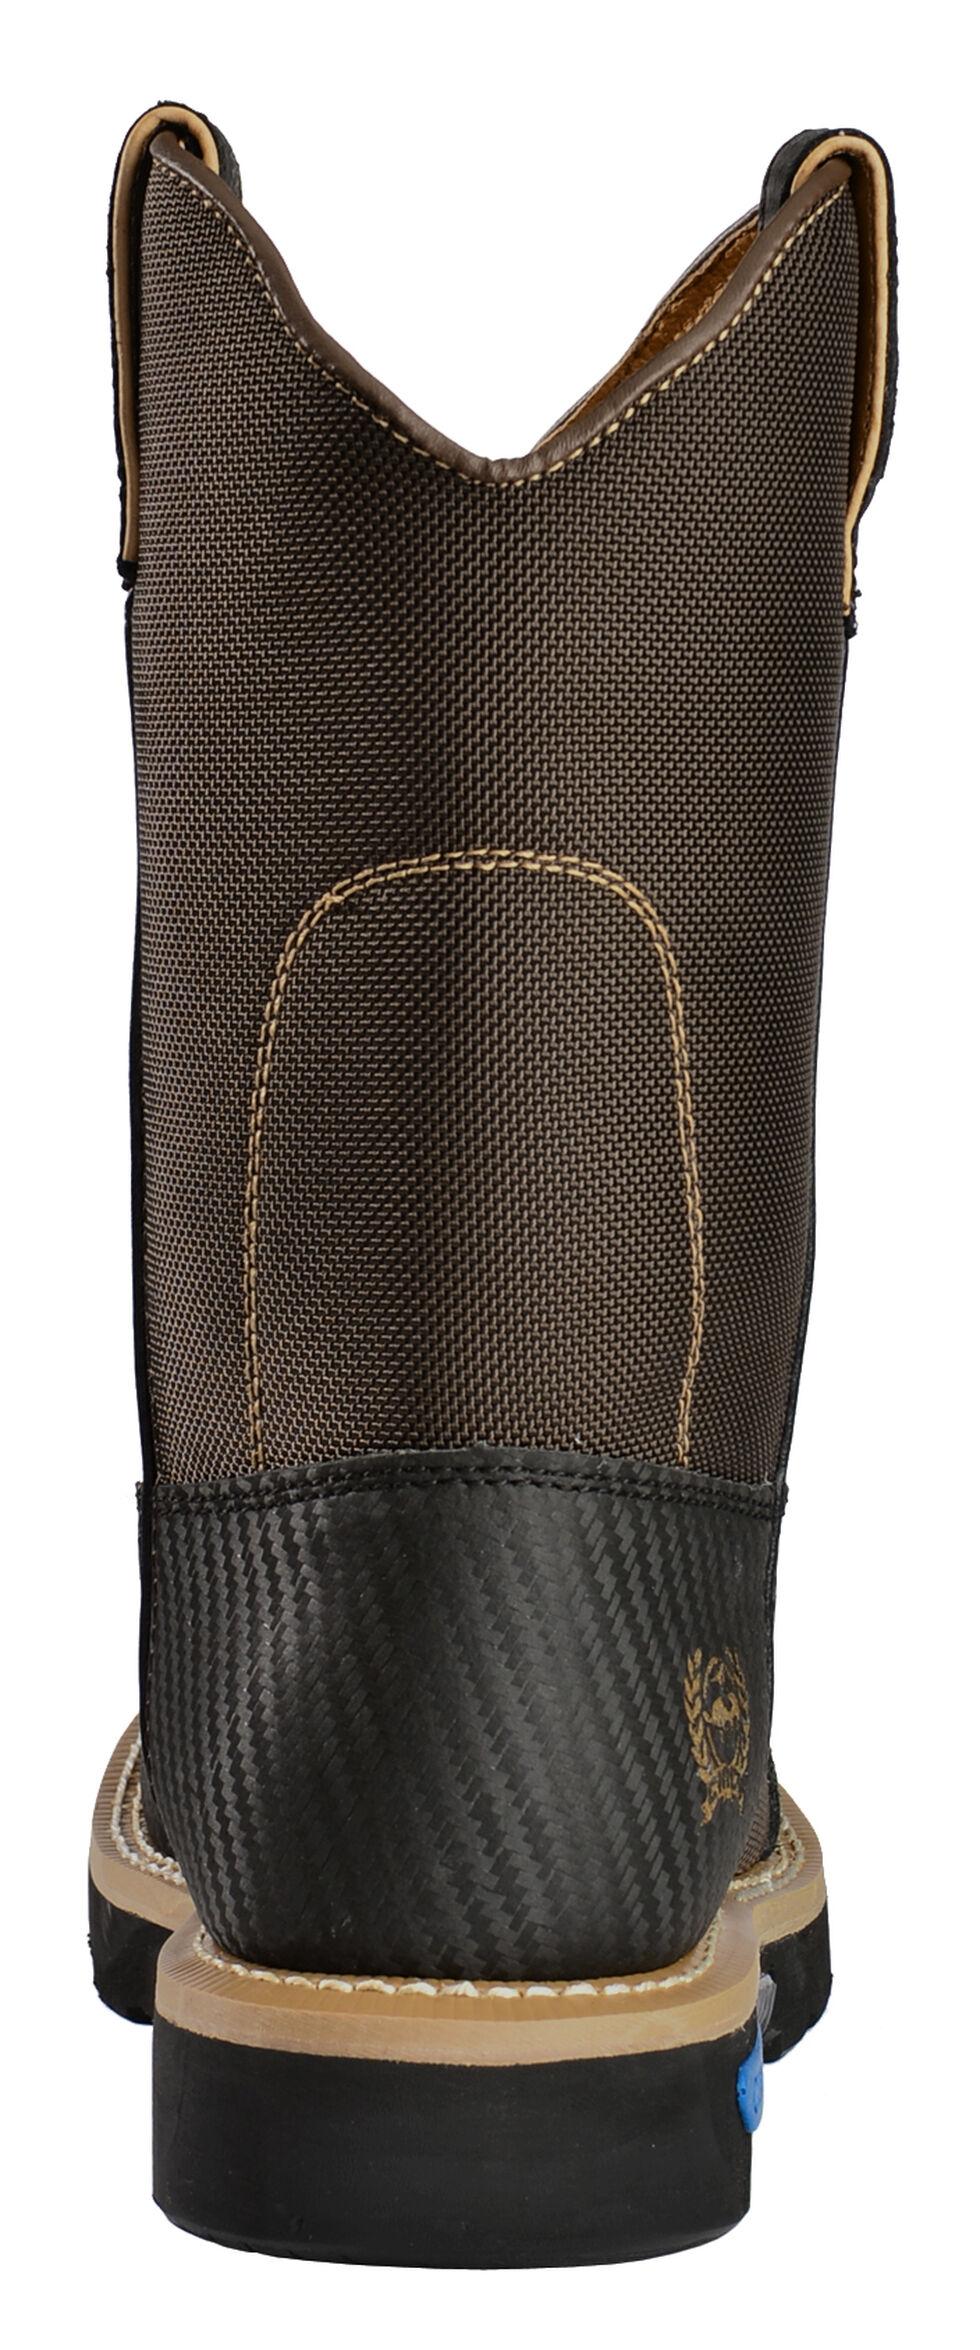 Cinch Men's Waterproof Work Boots - Ceramic Safety Toe, Brown, hi-res